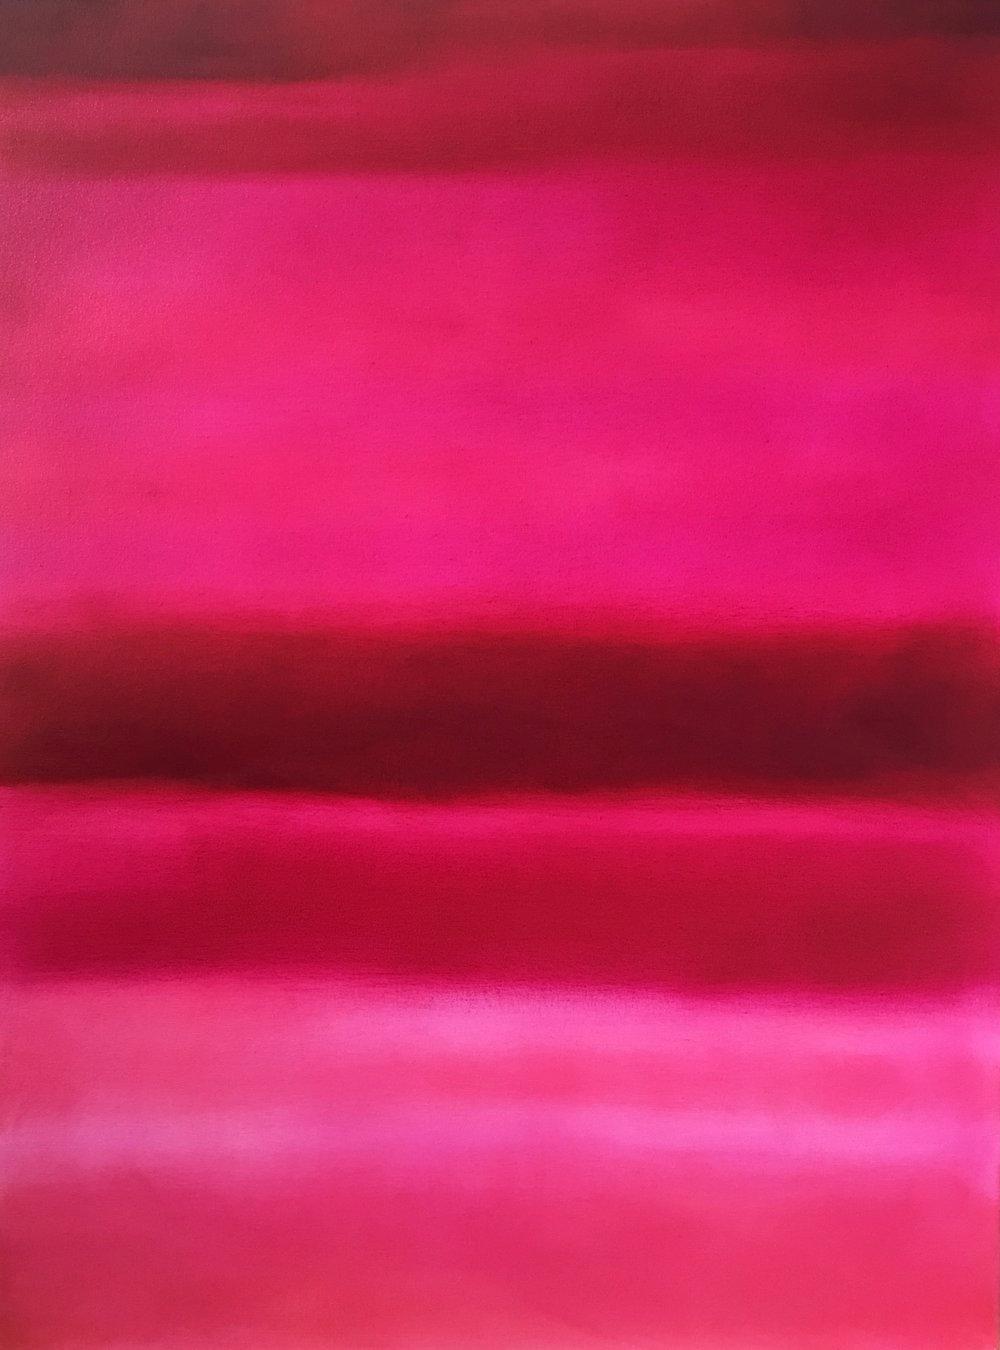 pink2_300dpi.jpg